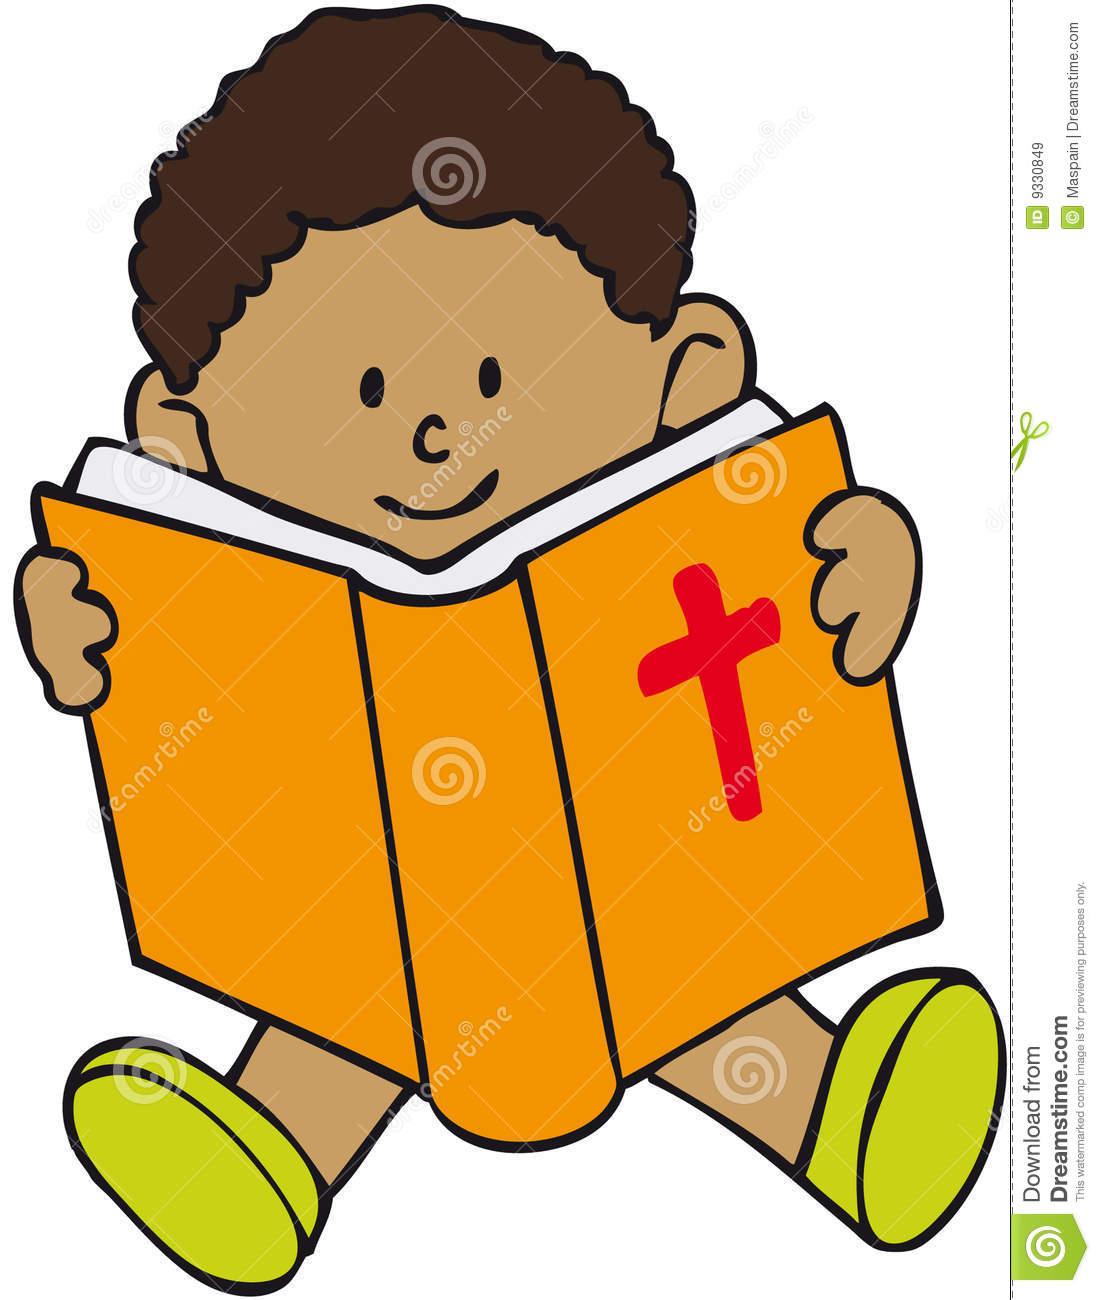 1100x1300 Religious Clip Art For Children Jesus Children